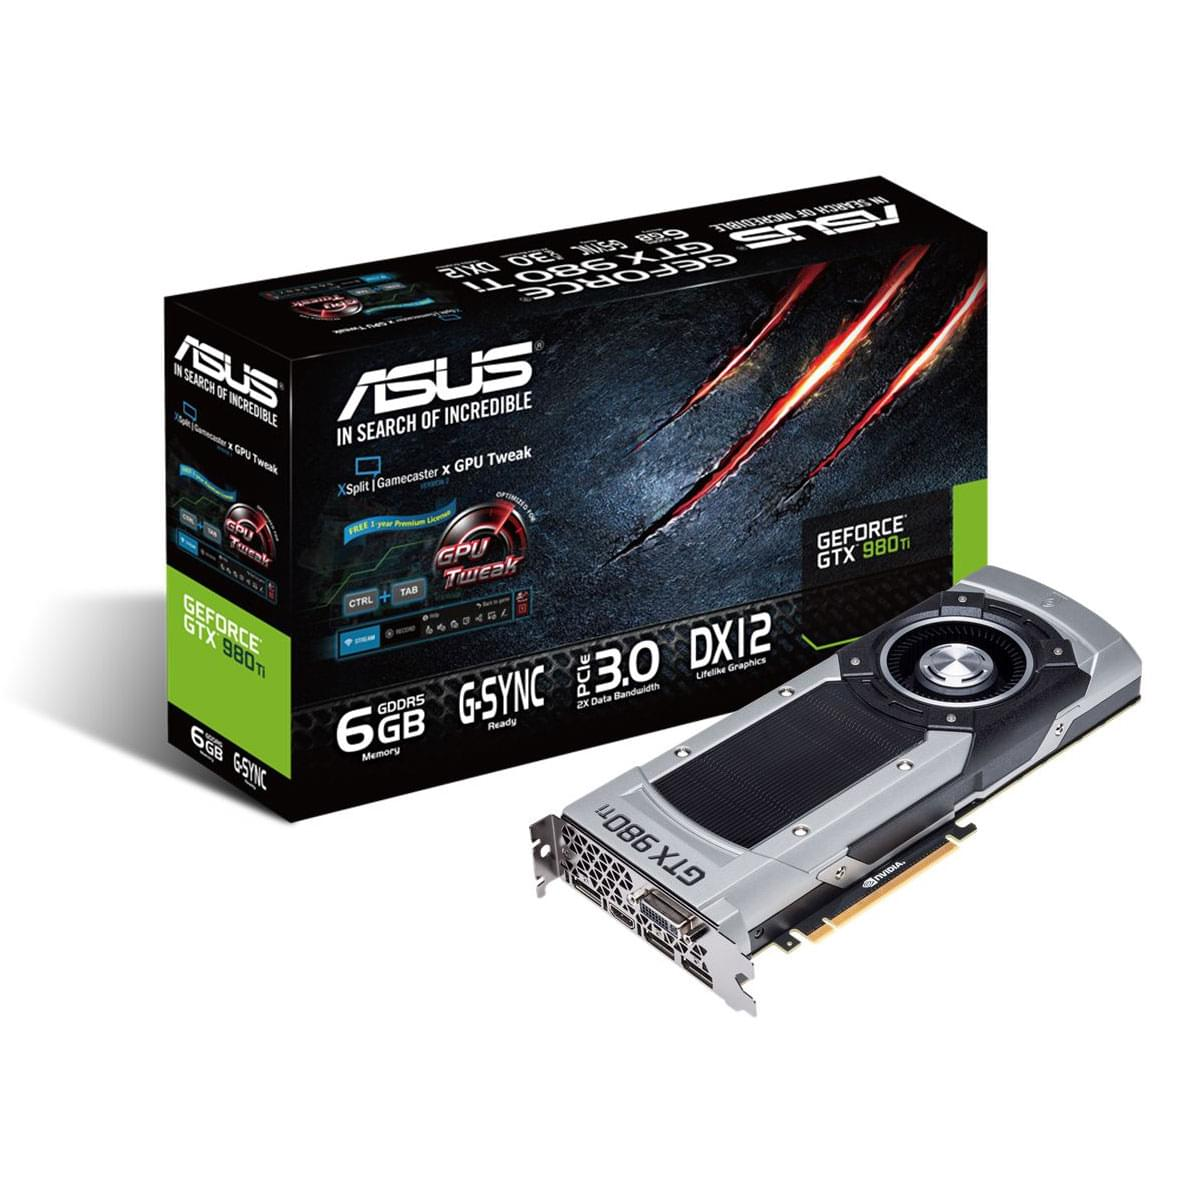 Asus GTX980Ti (90YV08M0-U0NM00) - Achat / Vente Carte Graphique sur Cybertek.fr - 0